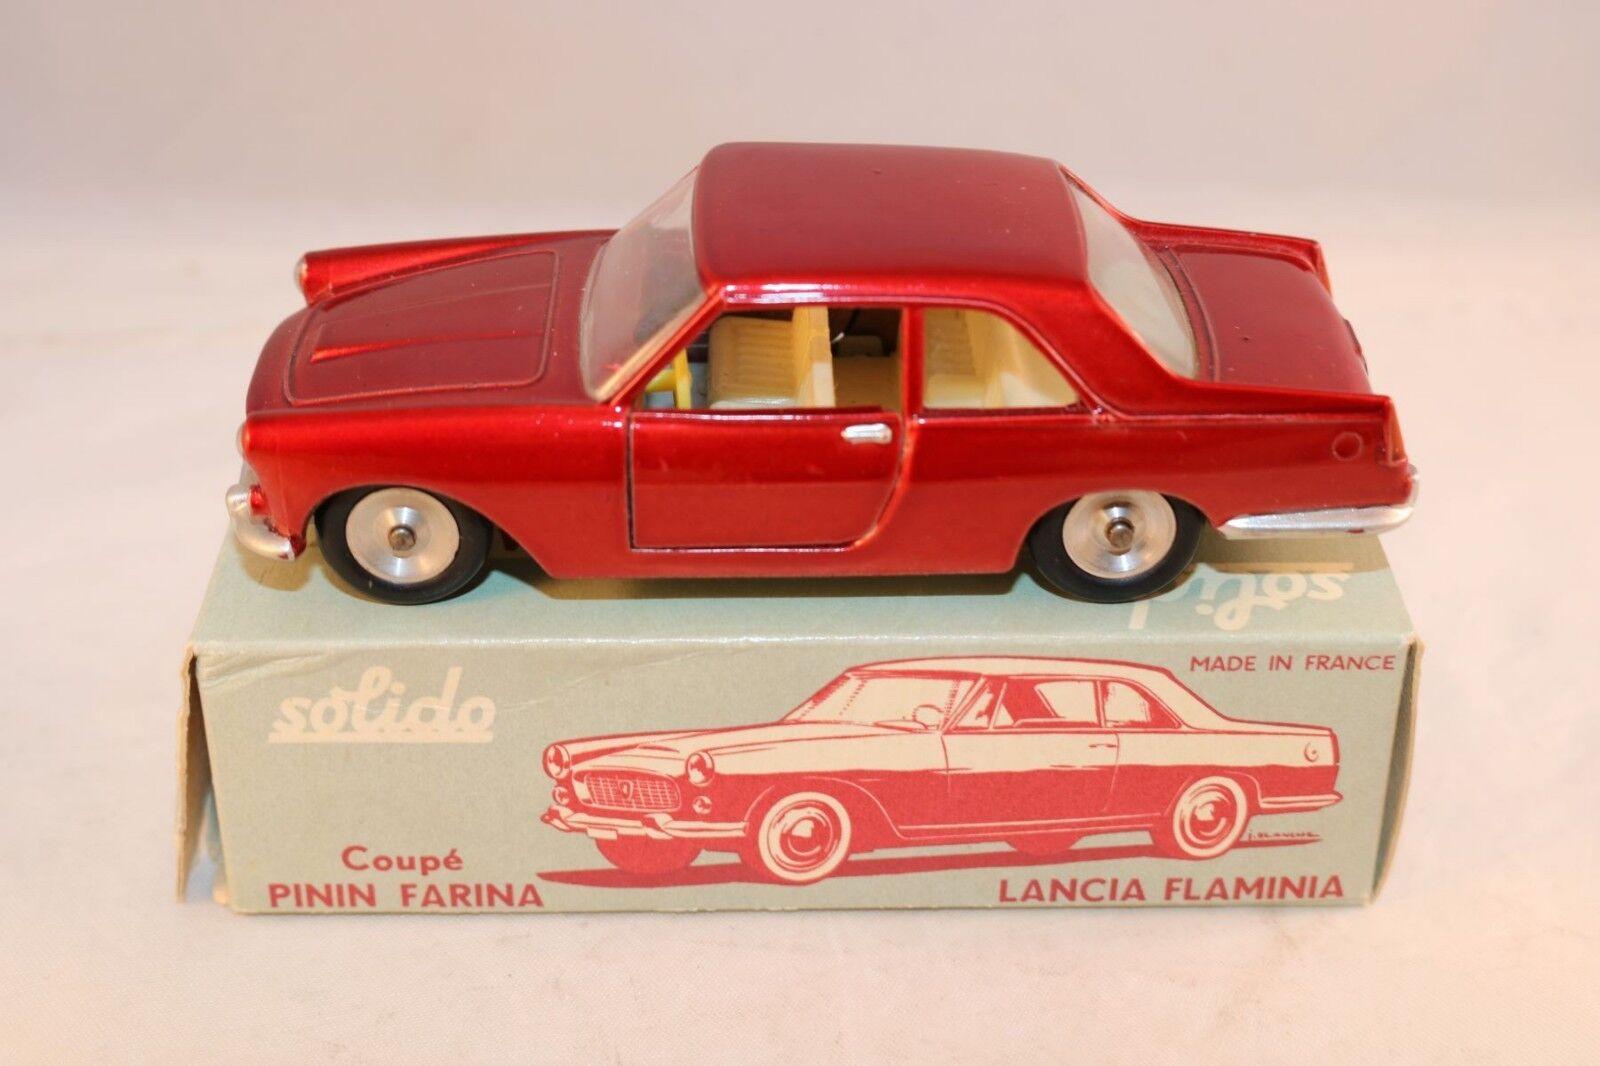 Solido 100 serie no 121 Lancia Flaminia perfect mint in excellent plus box